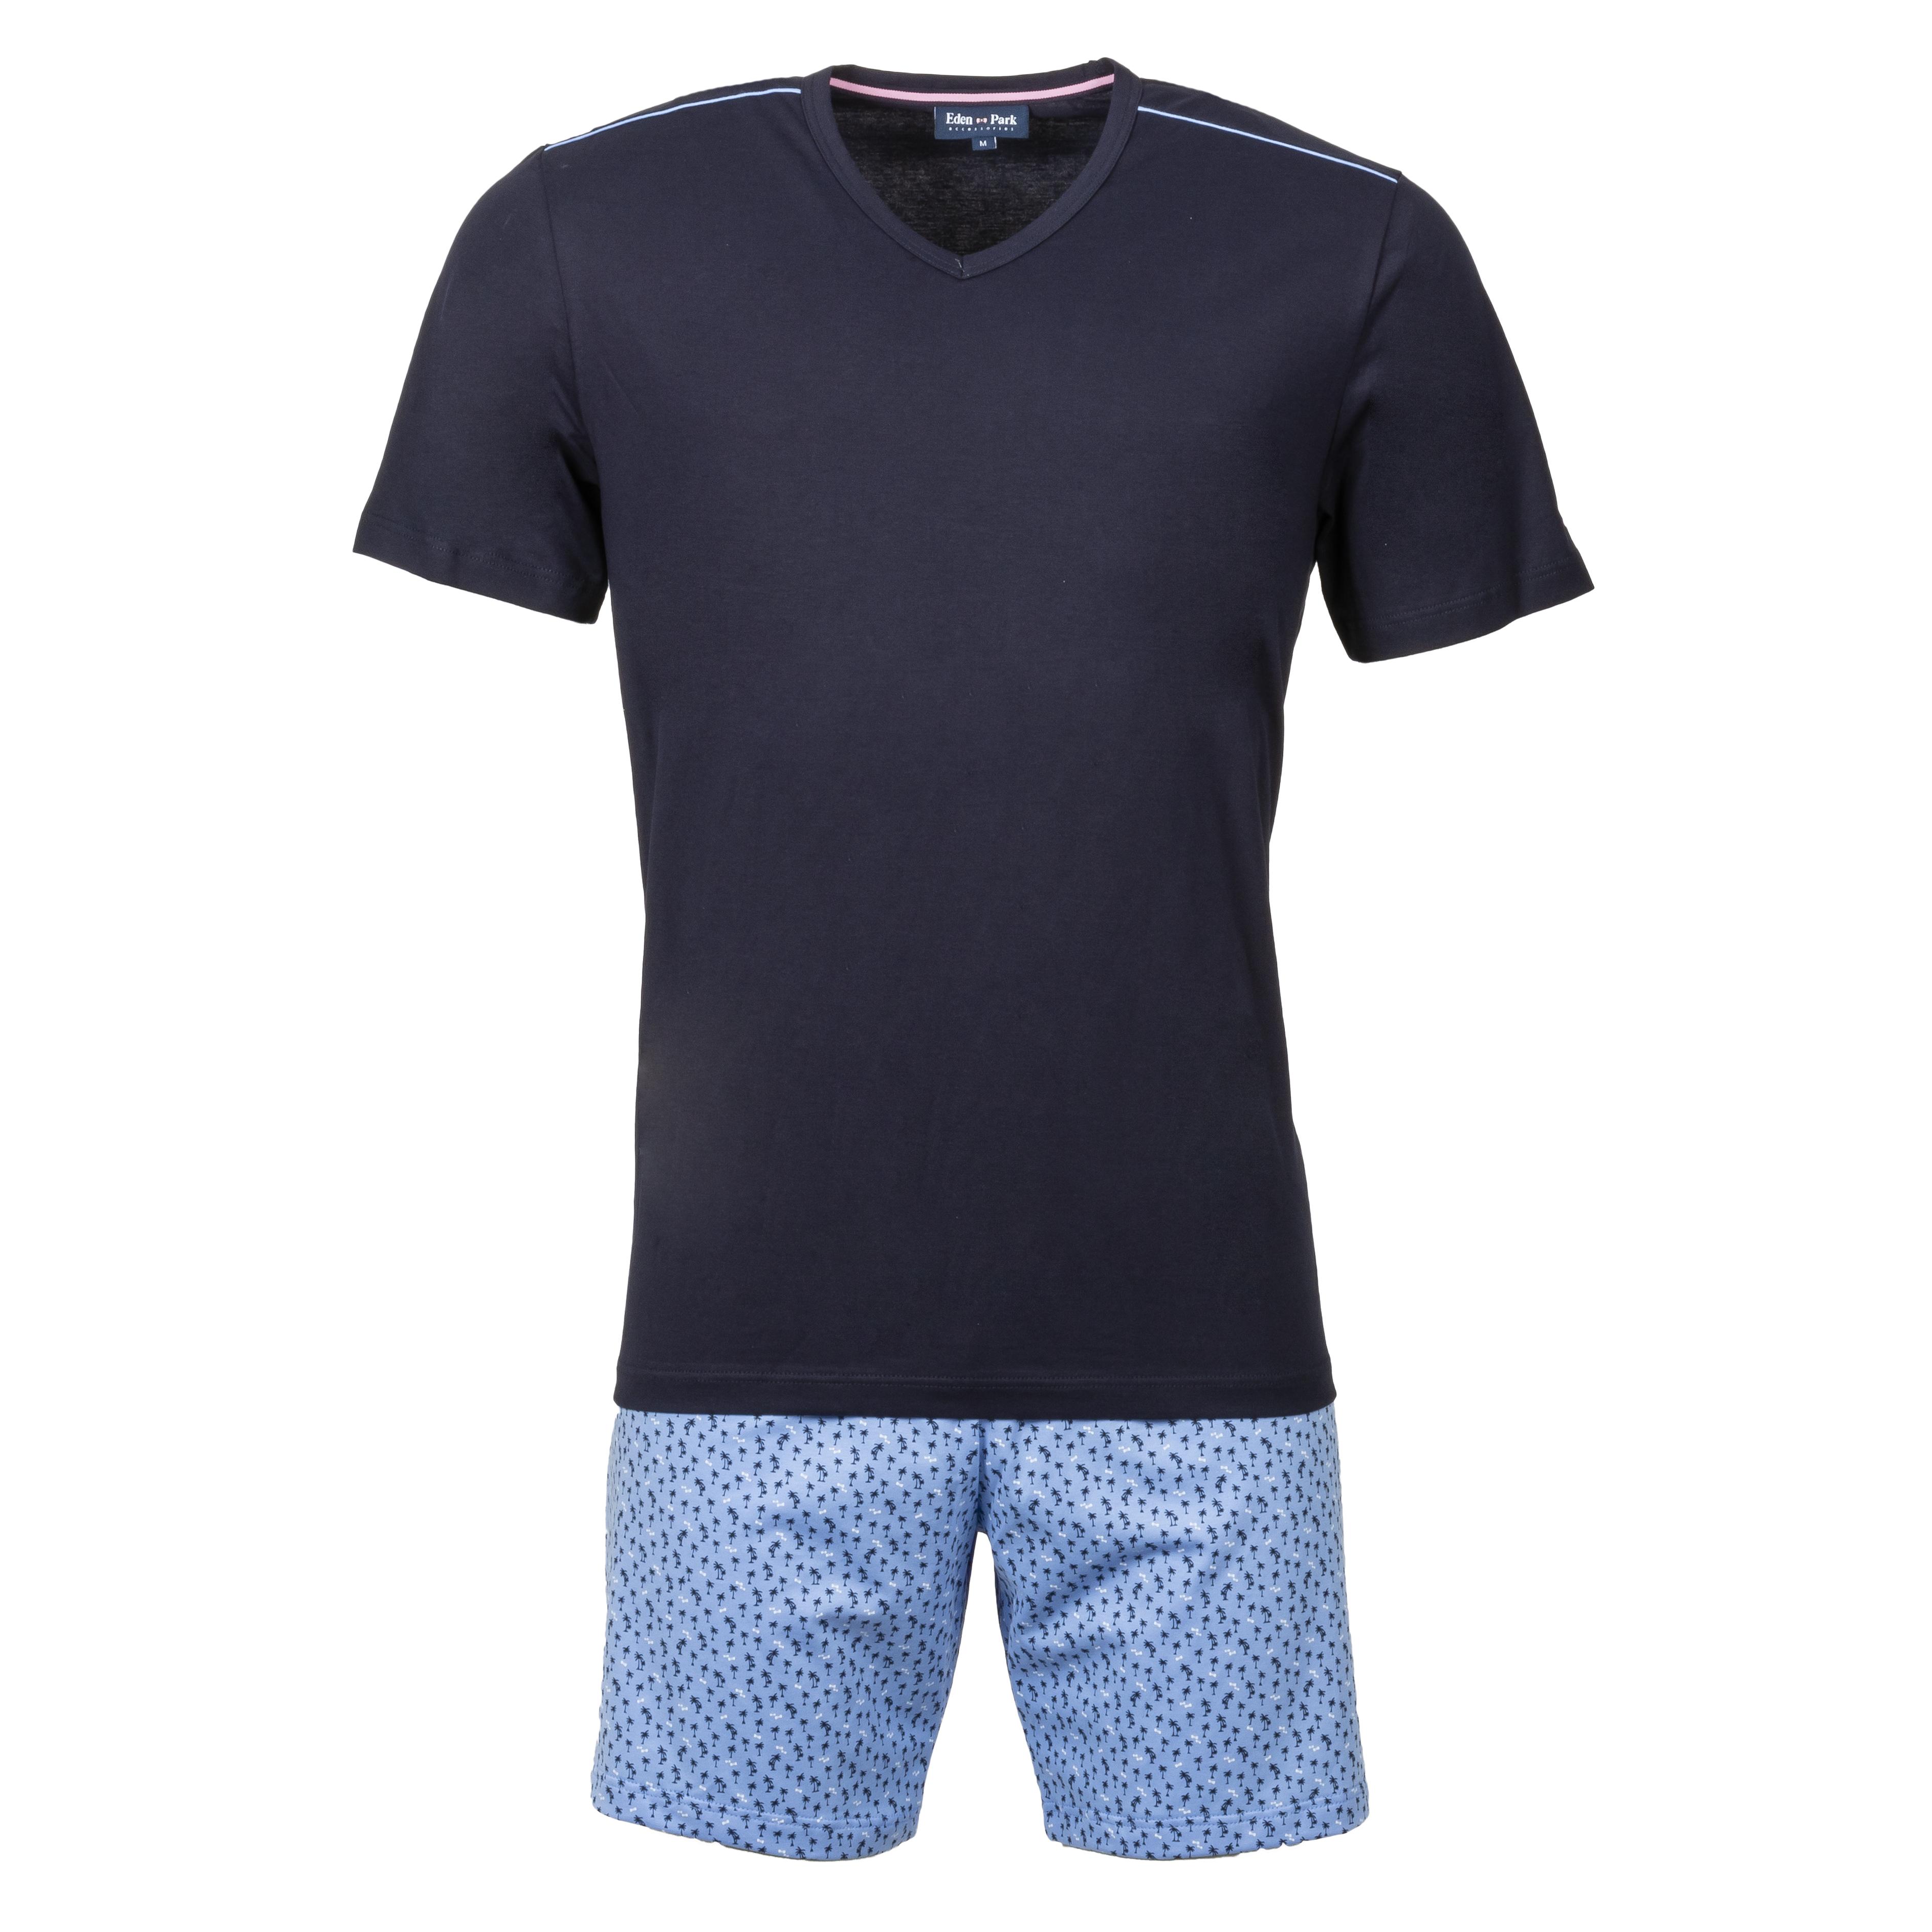 Pyjama court eden park en coton : tee-shirt col v bleu marine et short bleu ciel à motifs bleu marine